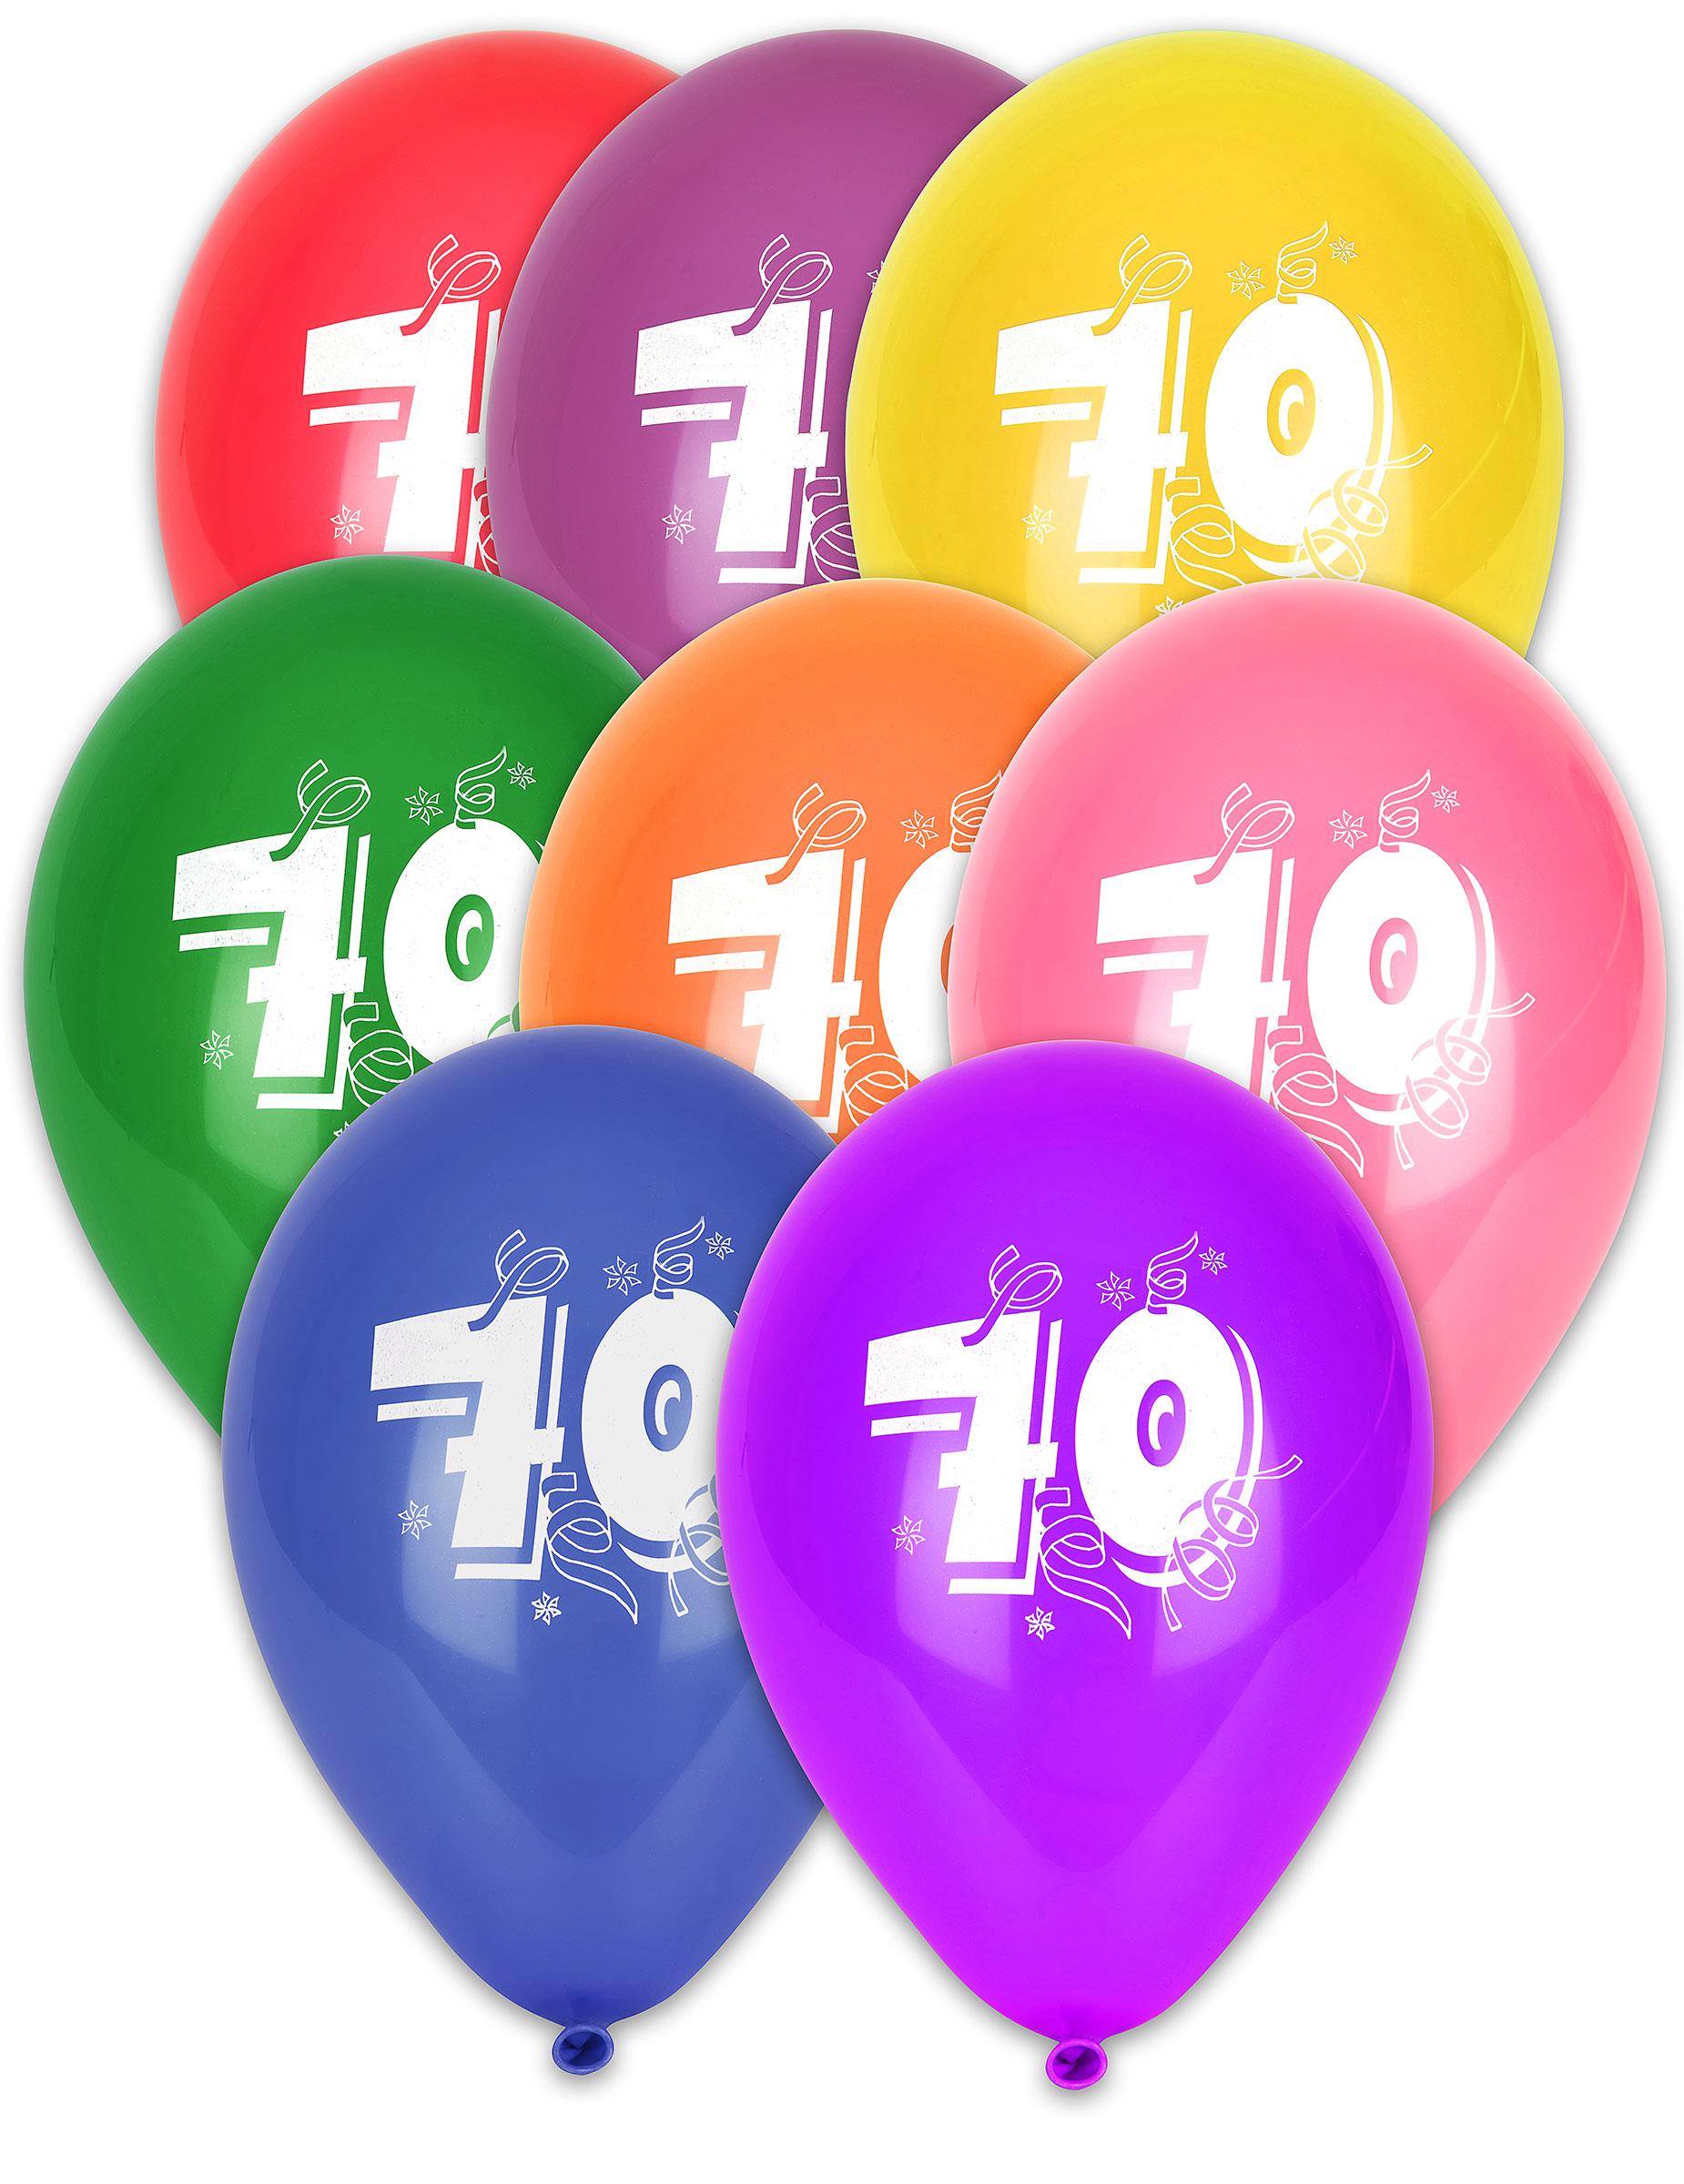 Deko Ballons Party Ballon bunt Luftballons Zahl 25 Geburtstag 8 St